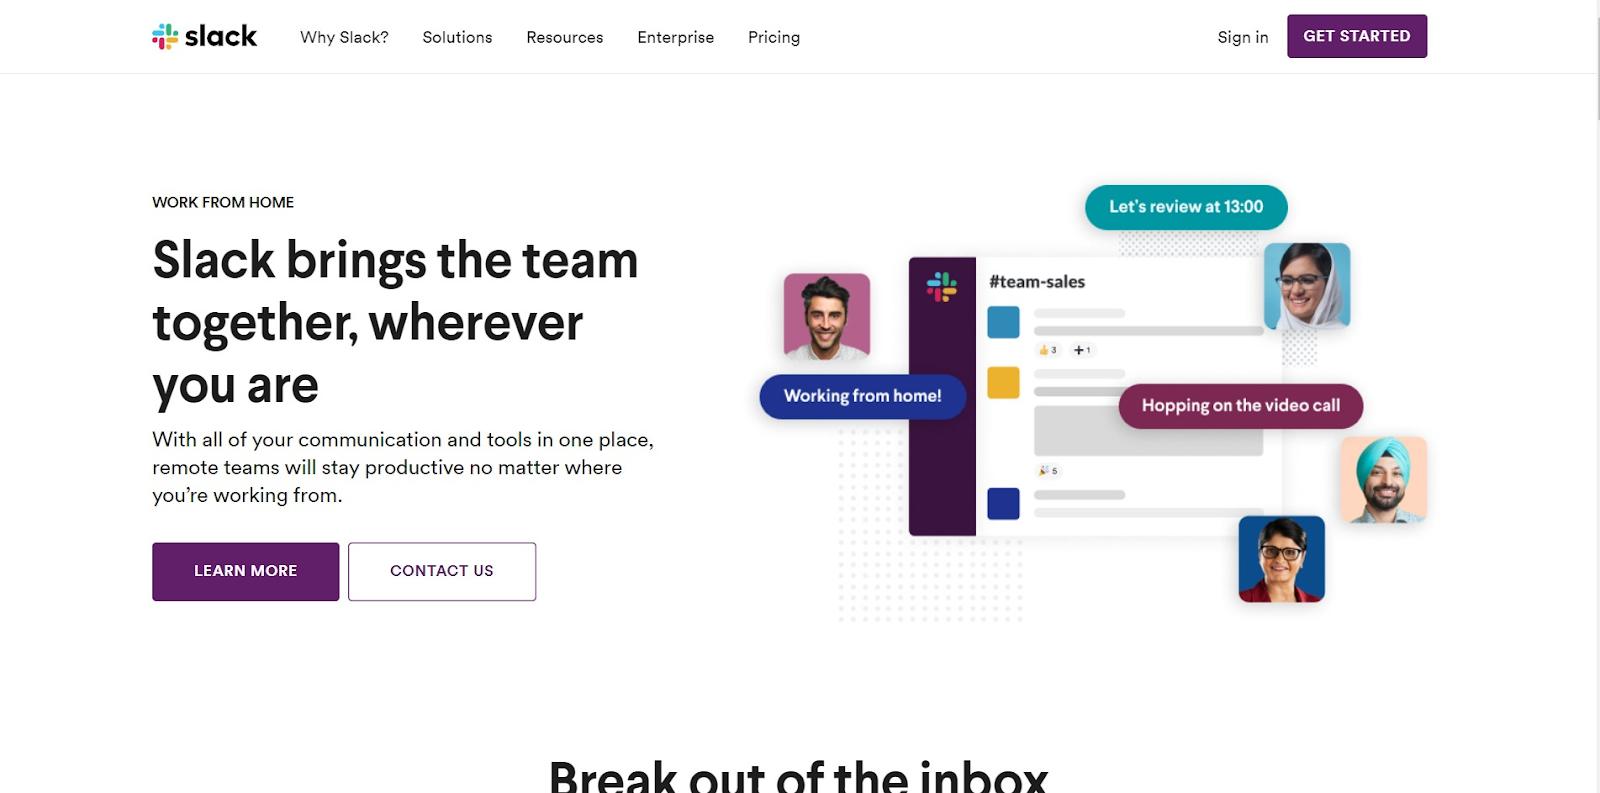 Slack homepage view